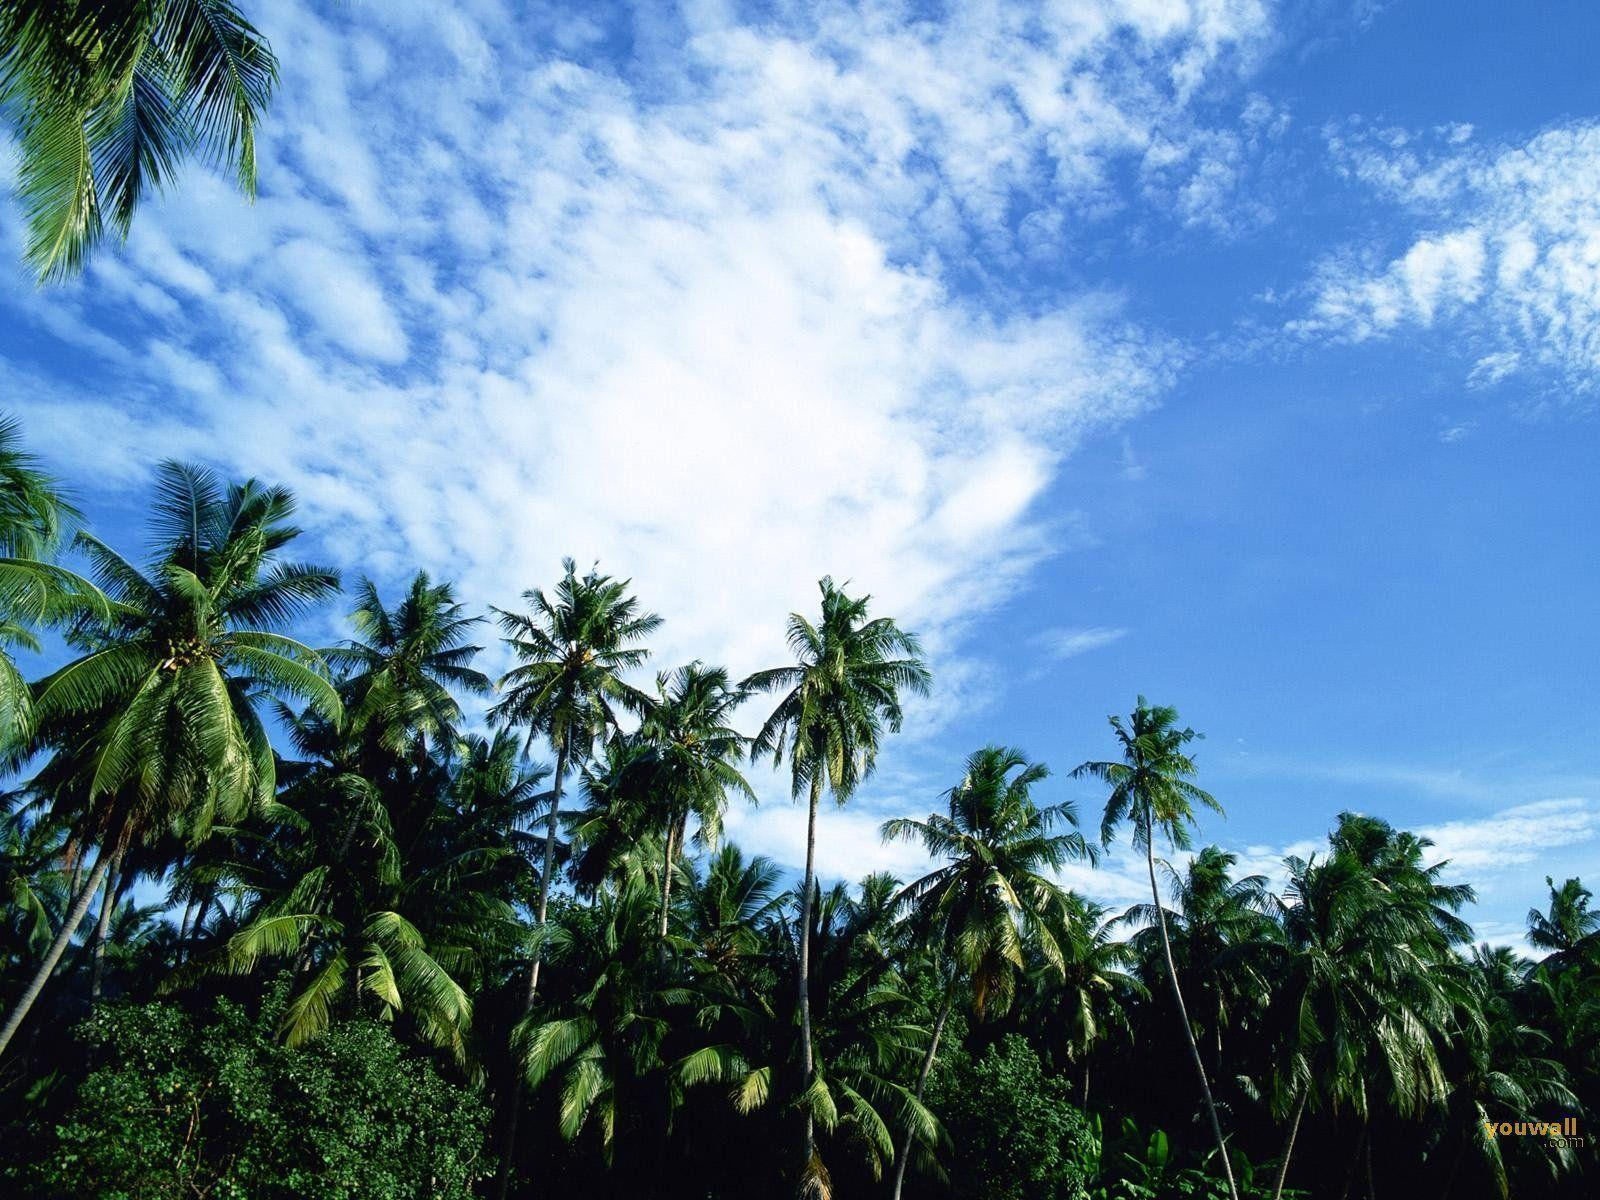 tropical jungle wallpaper - photo #36